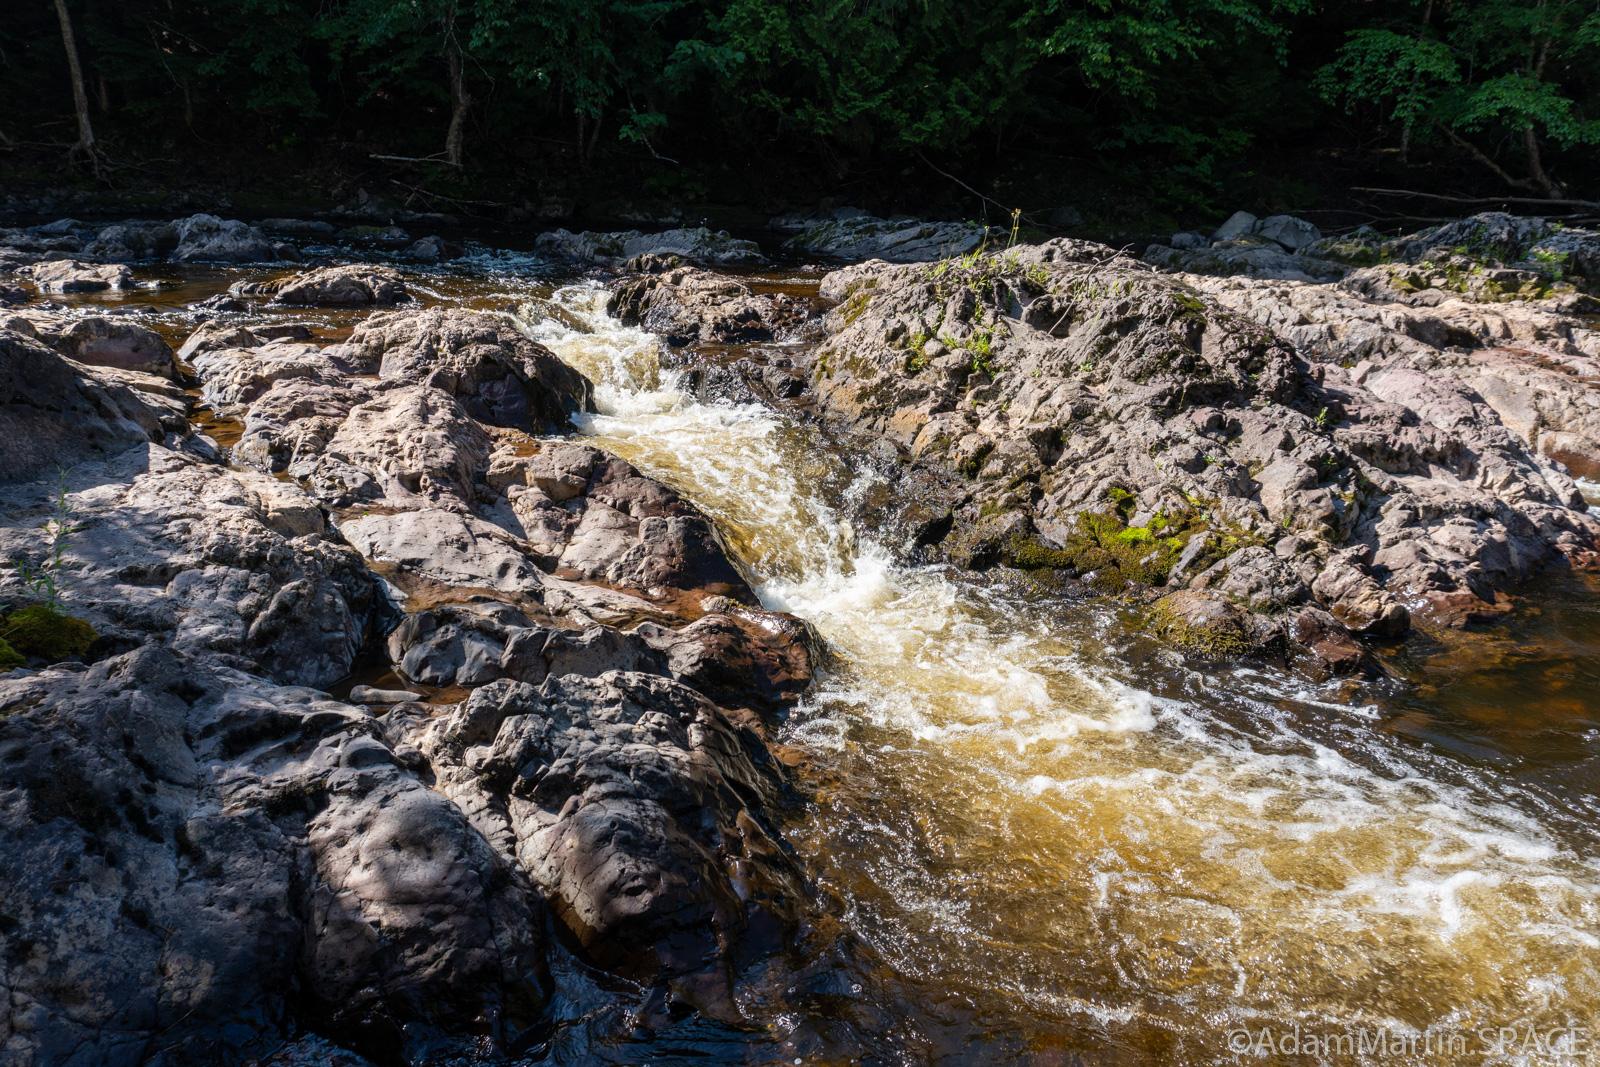 Potato River Dalles - Waterfall tunneling through rocks